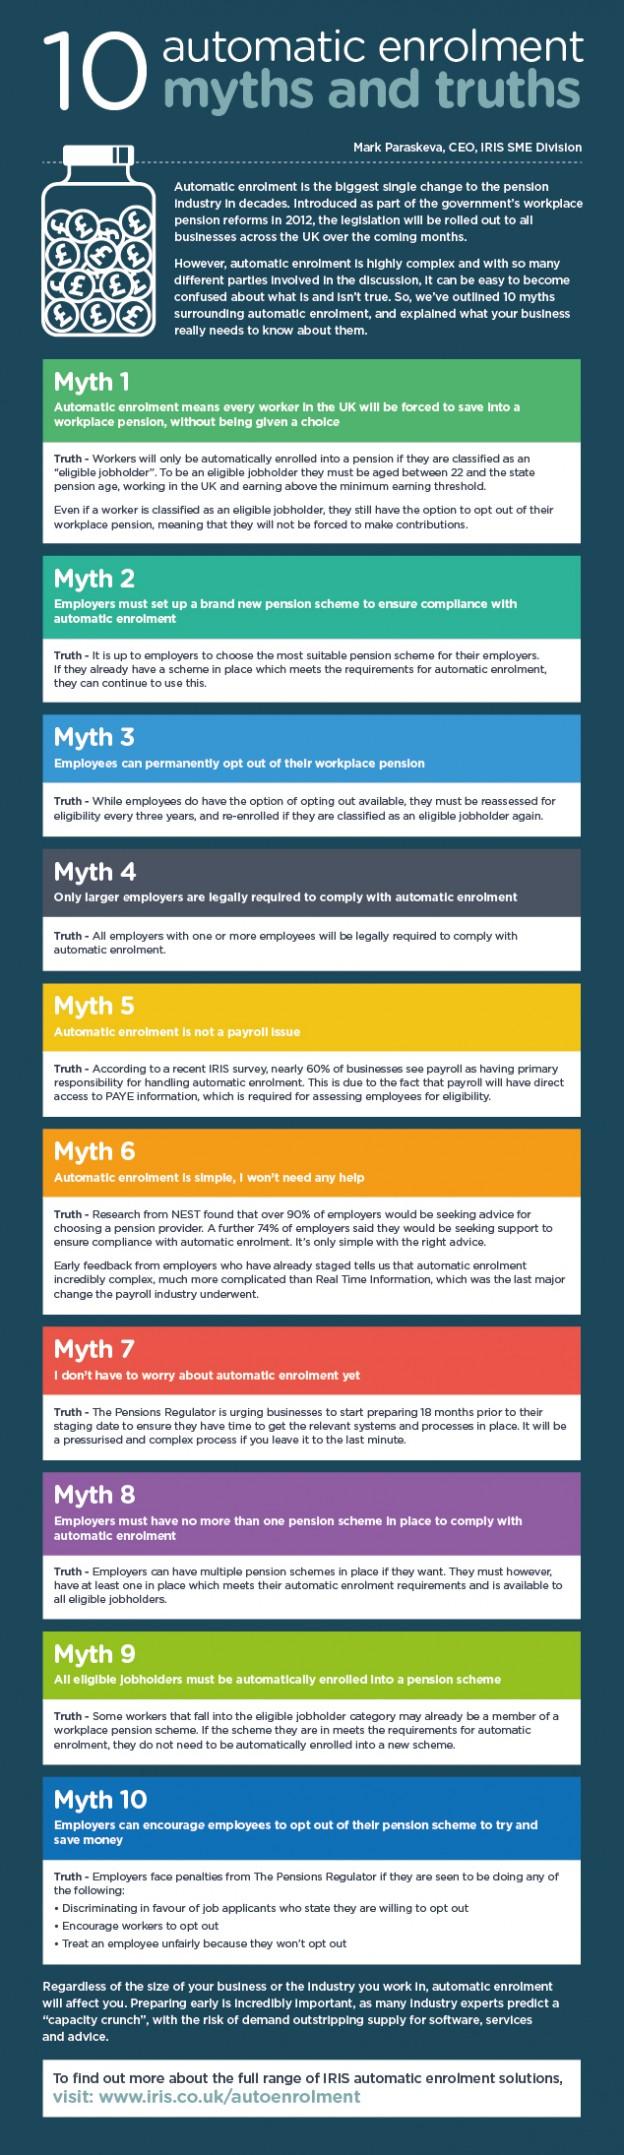 IFA SHOPS 10 MYTHS  TRUTHS (2)